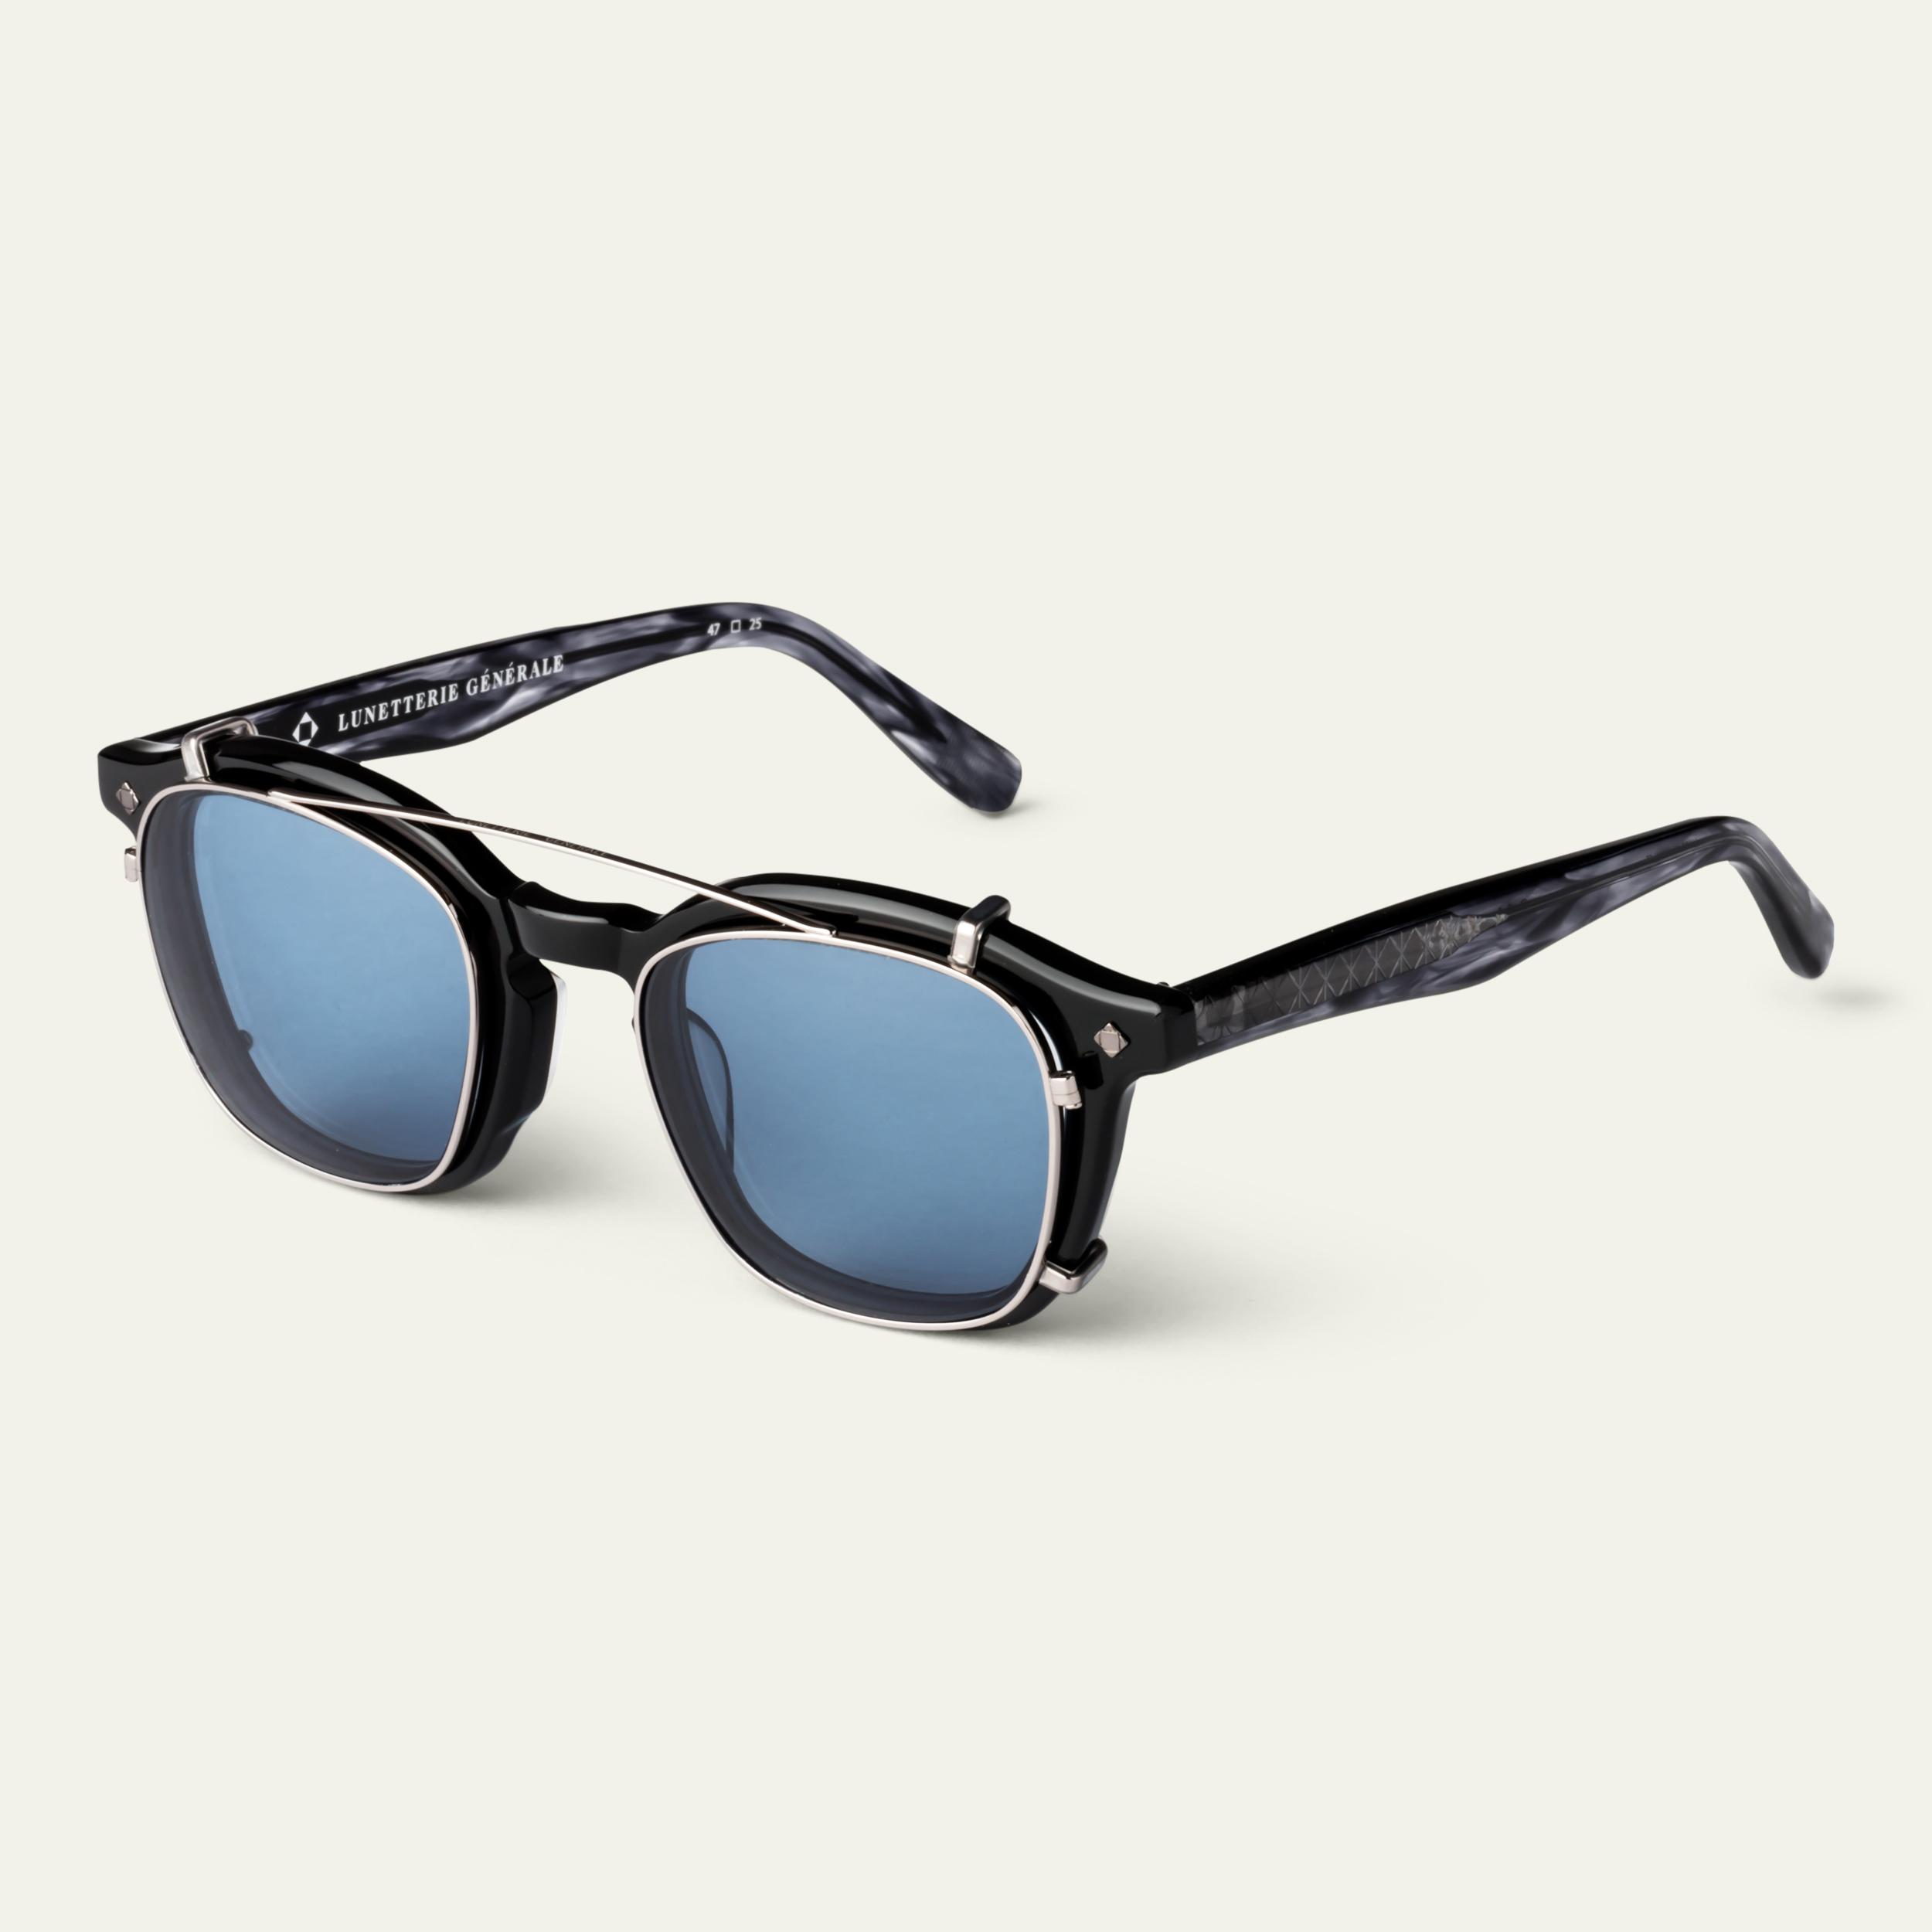 Lunetterie Generale Sonnenbrille